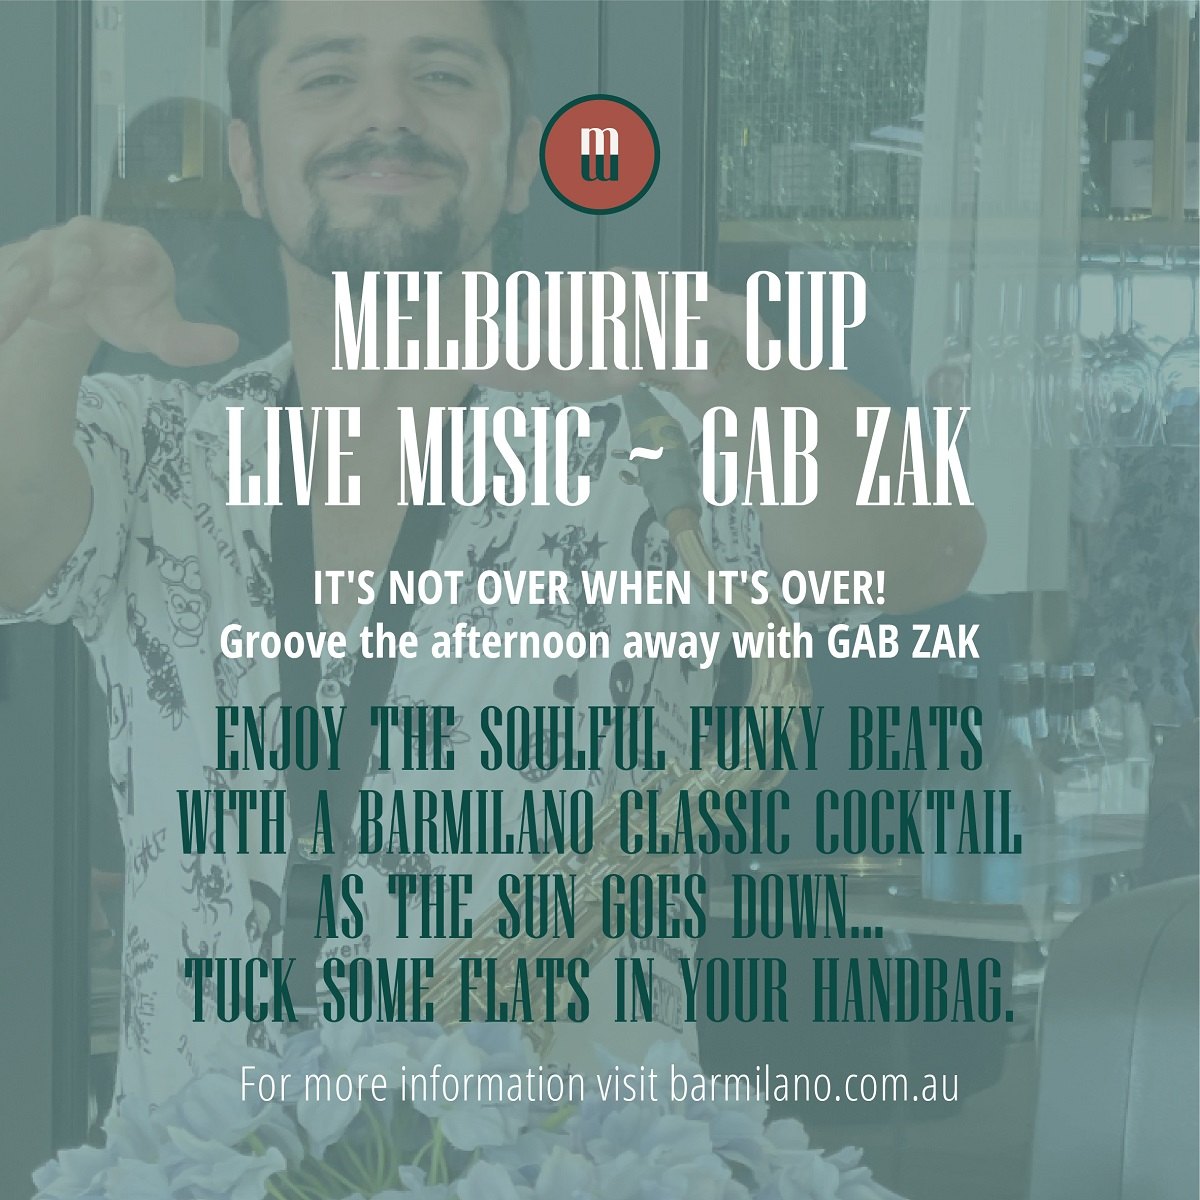 Celebrate Melbourne cup at barmilano